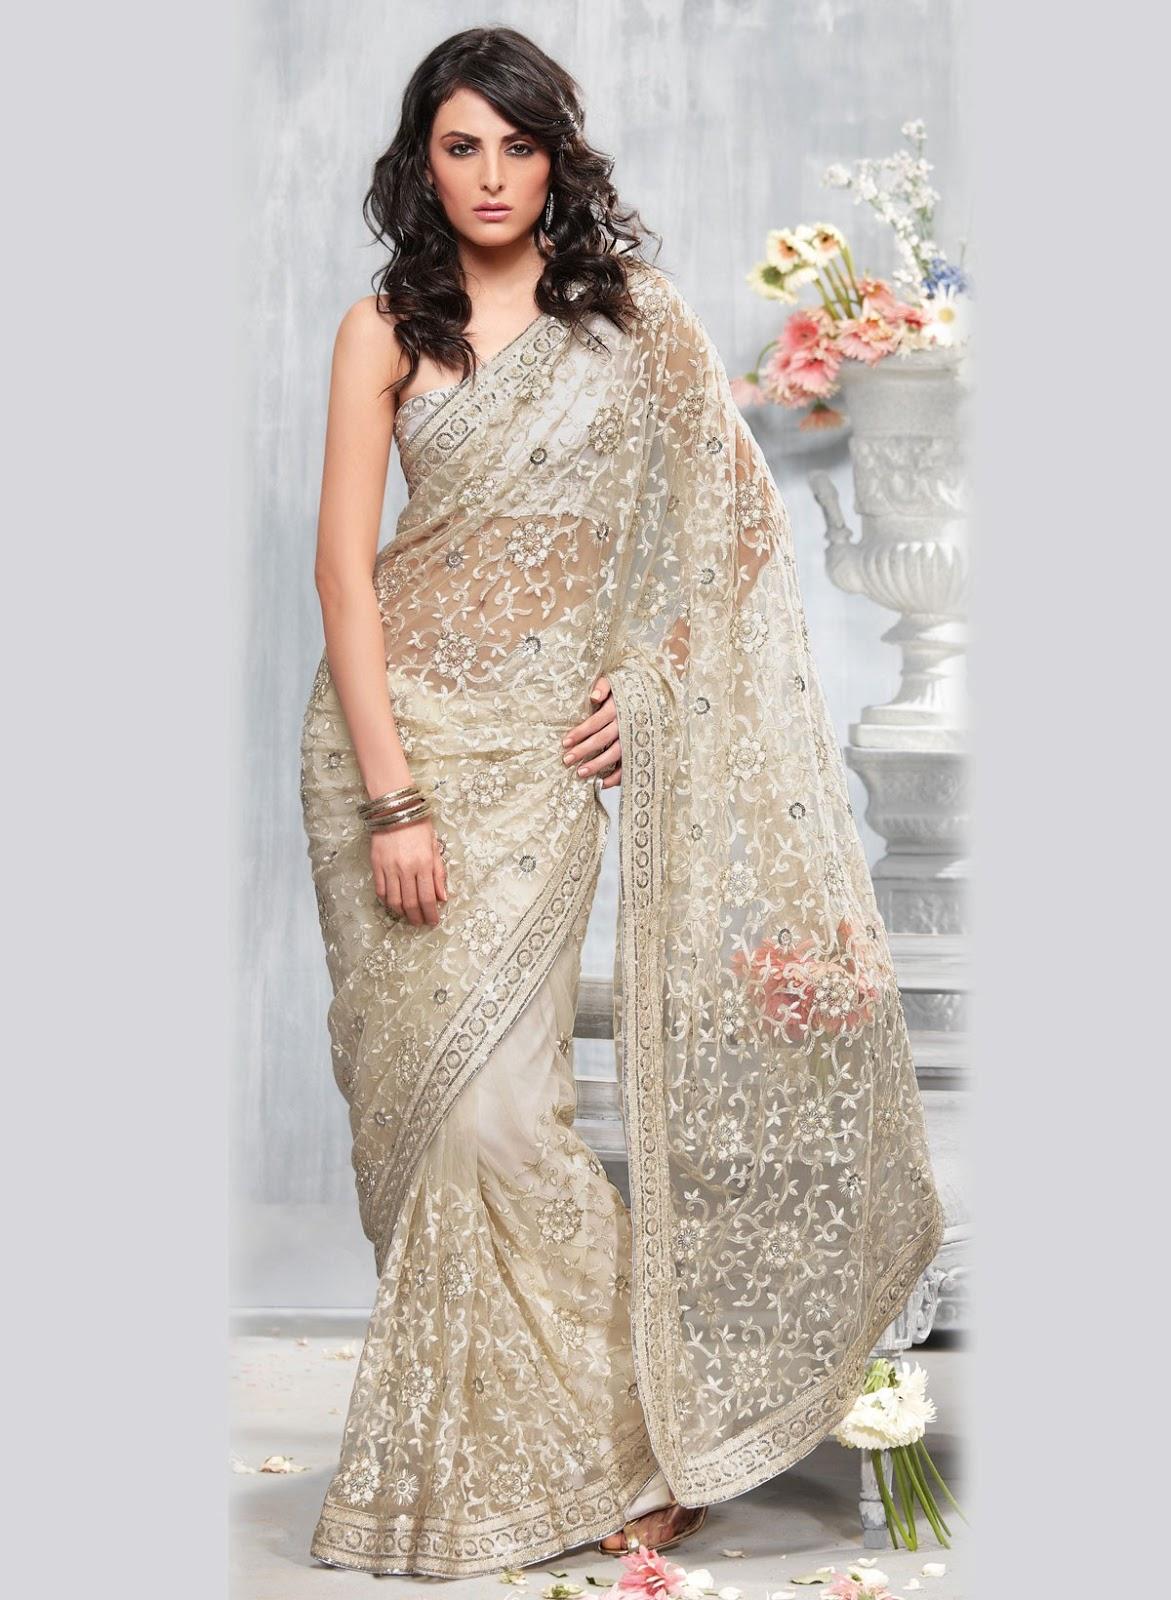 White Saree Tamanna In Veeram: A WEDDING PLANNER: Party Wear Sares, Cocktail Sarees, Lace